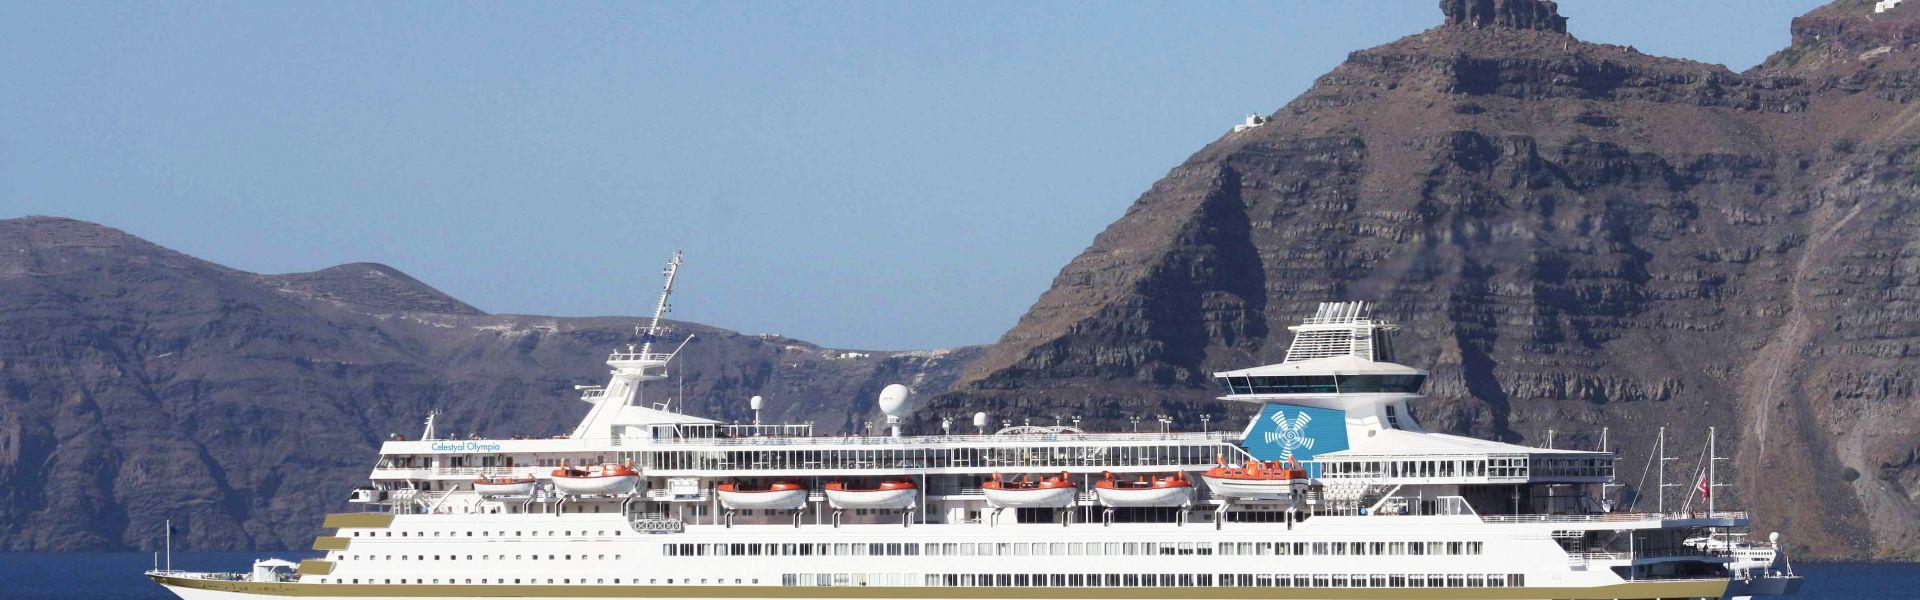 Croaziera 2018 - Insulele Grecesti (Atena) - Celestyal Cruises - Celestyal Olympia - 3 nopti